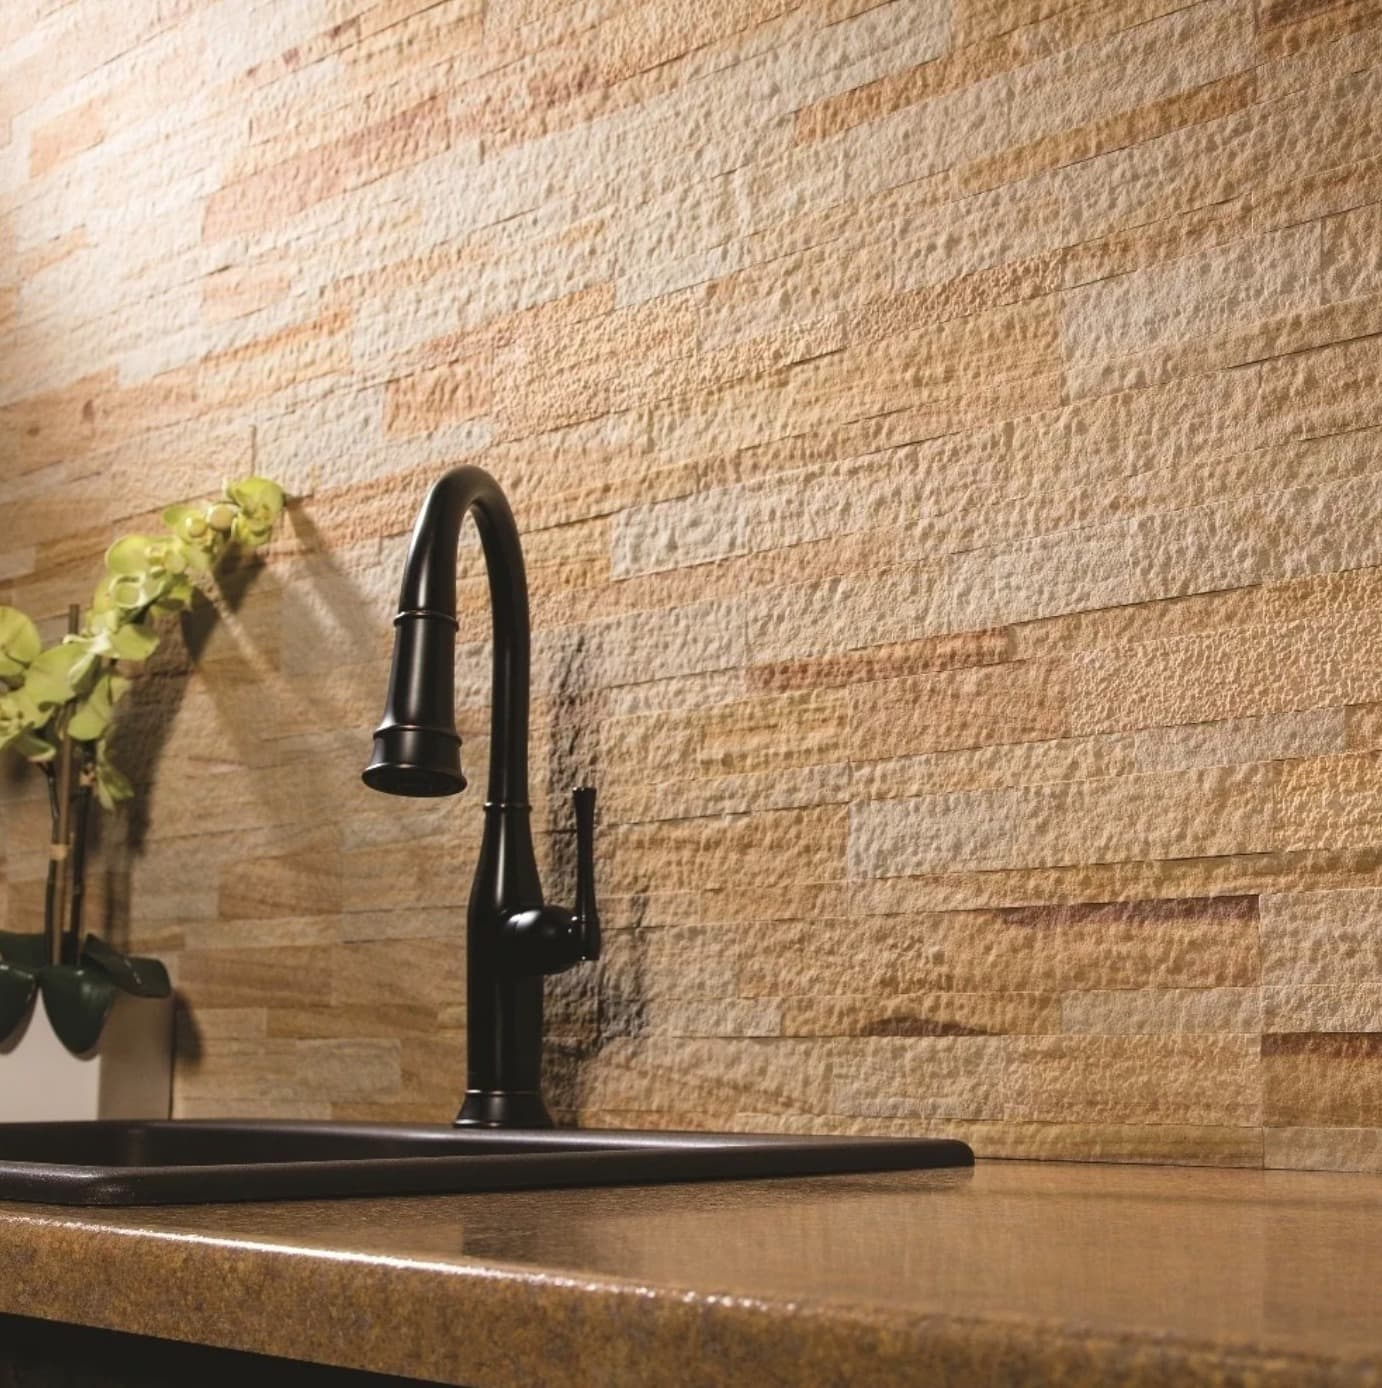 Use this Sandstone to Create a Warm-Toned Kitchen Backsplash